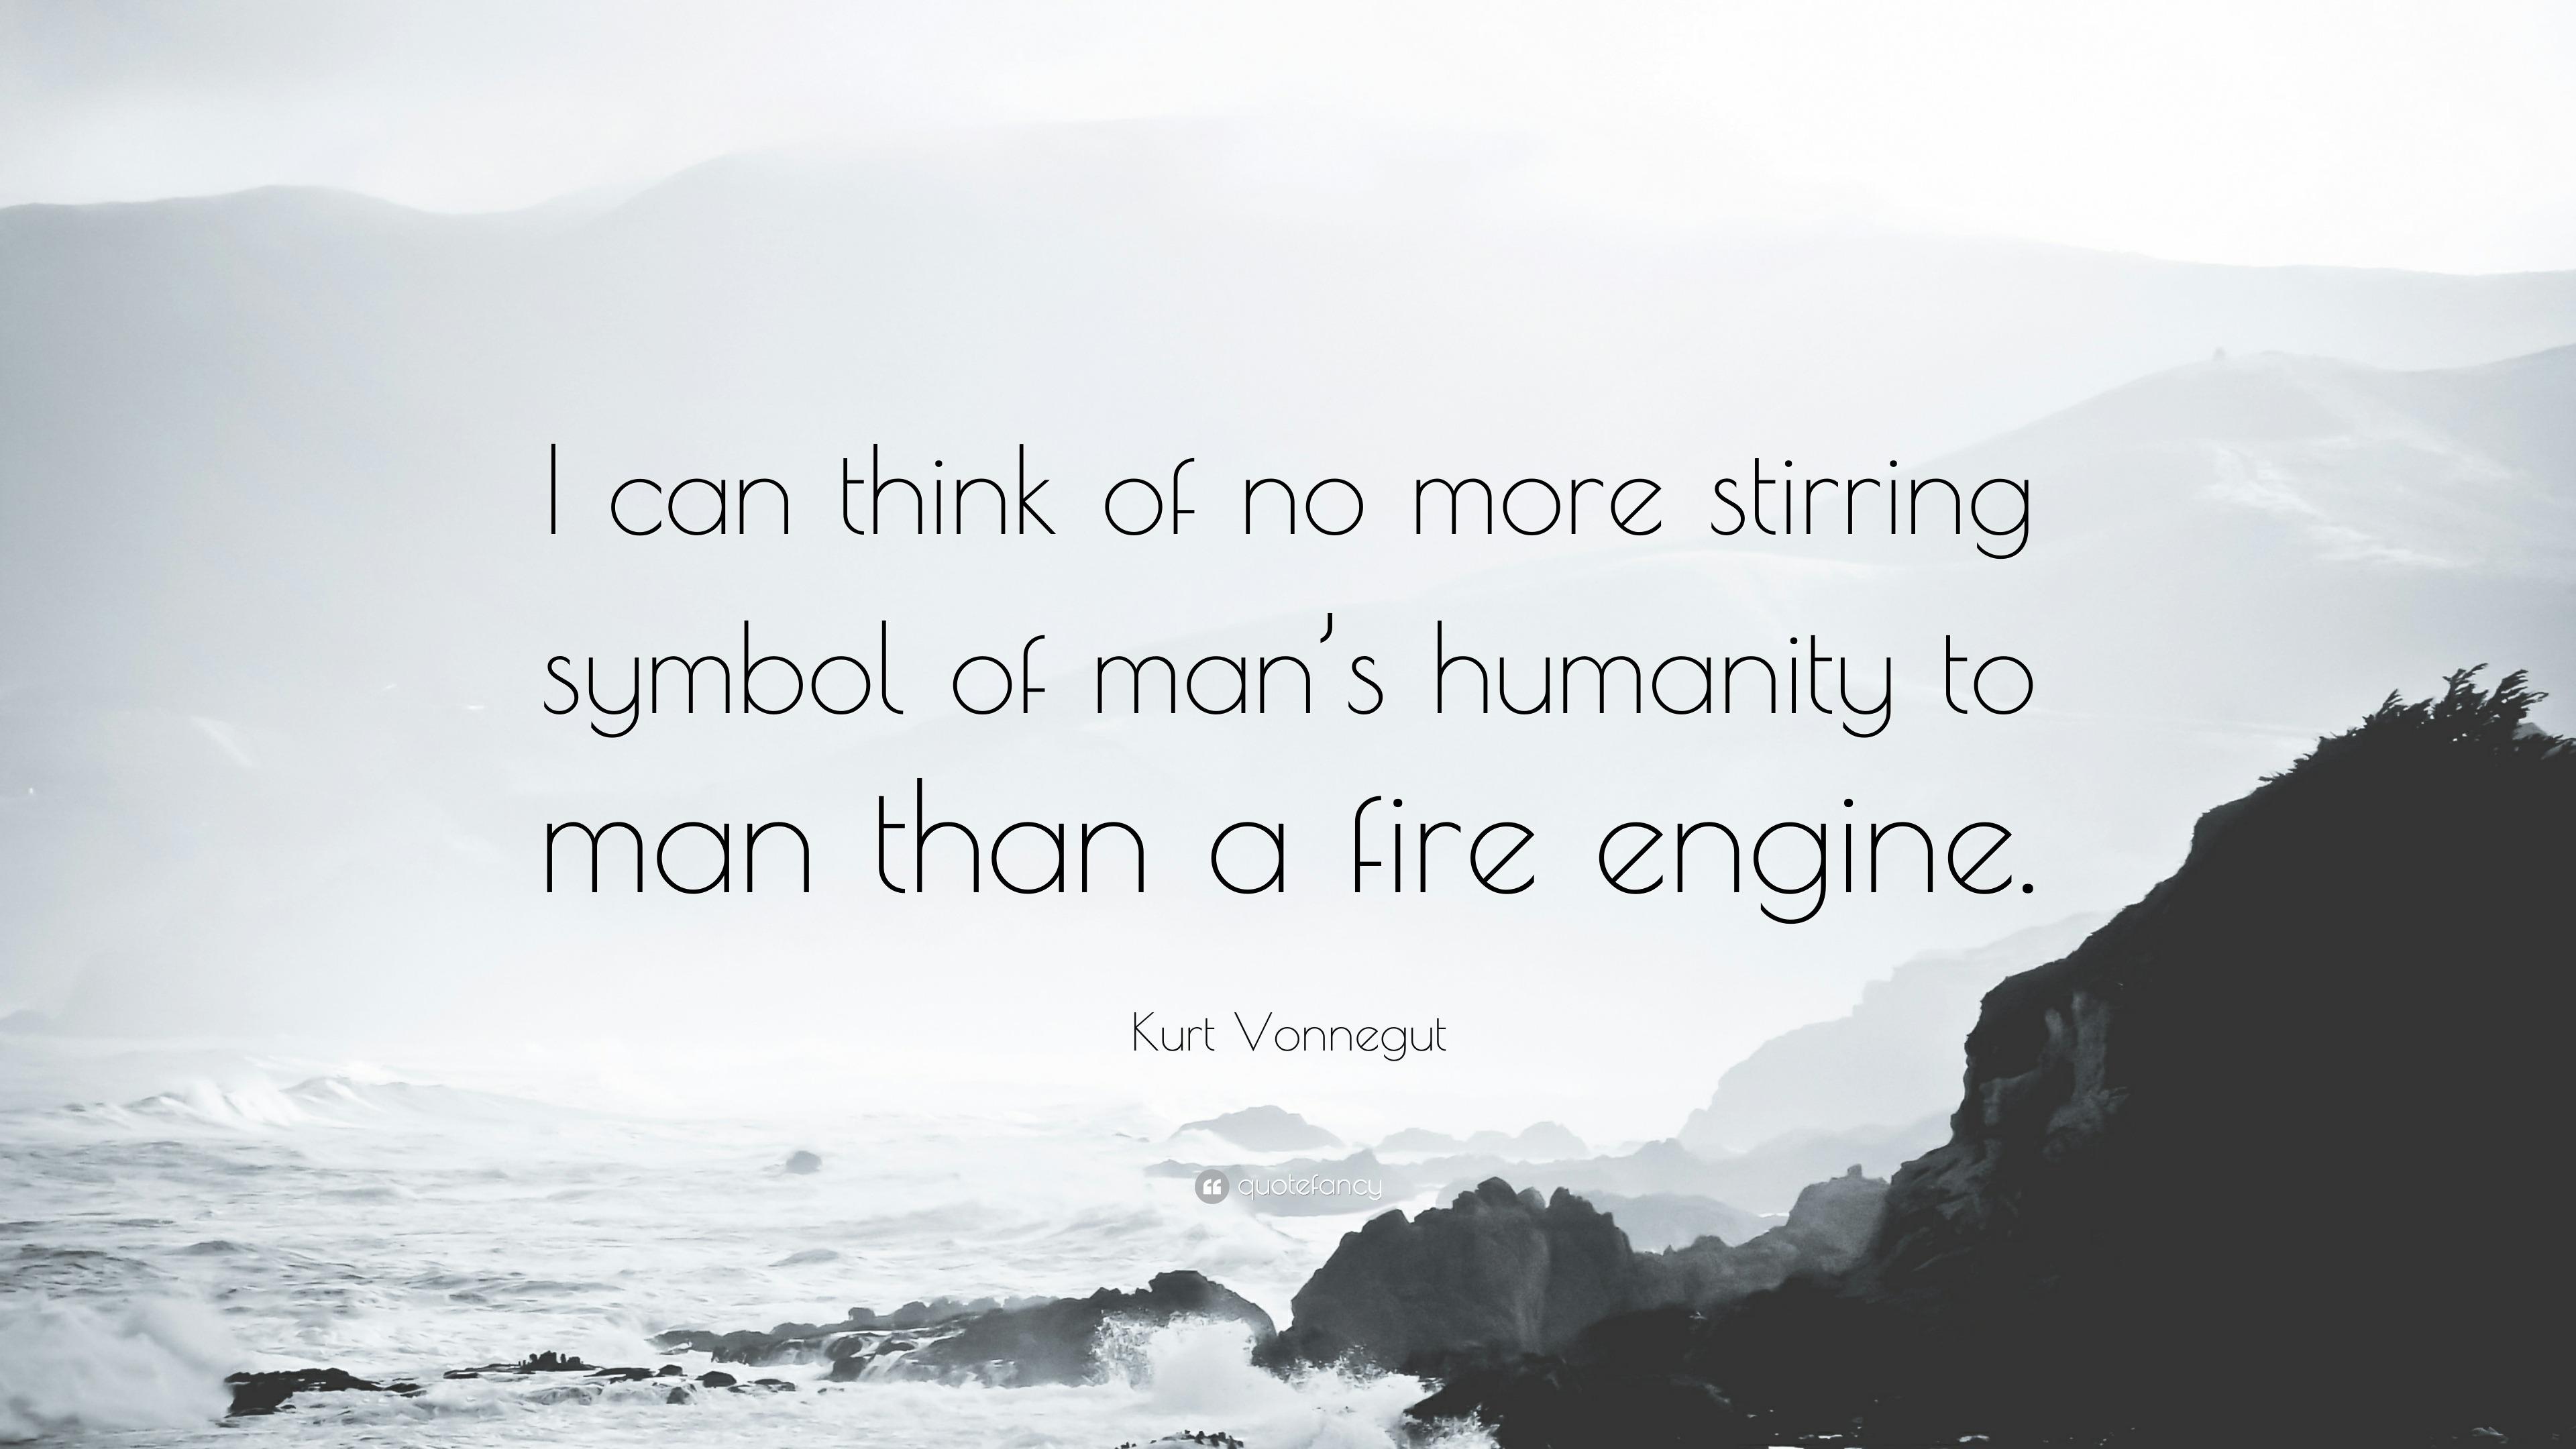 kurt vonnegut quote   u201ci can think of no more stirring symbol of man u2019s humanity to man than a